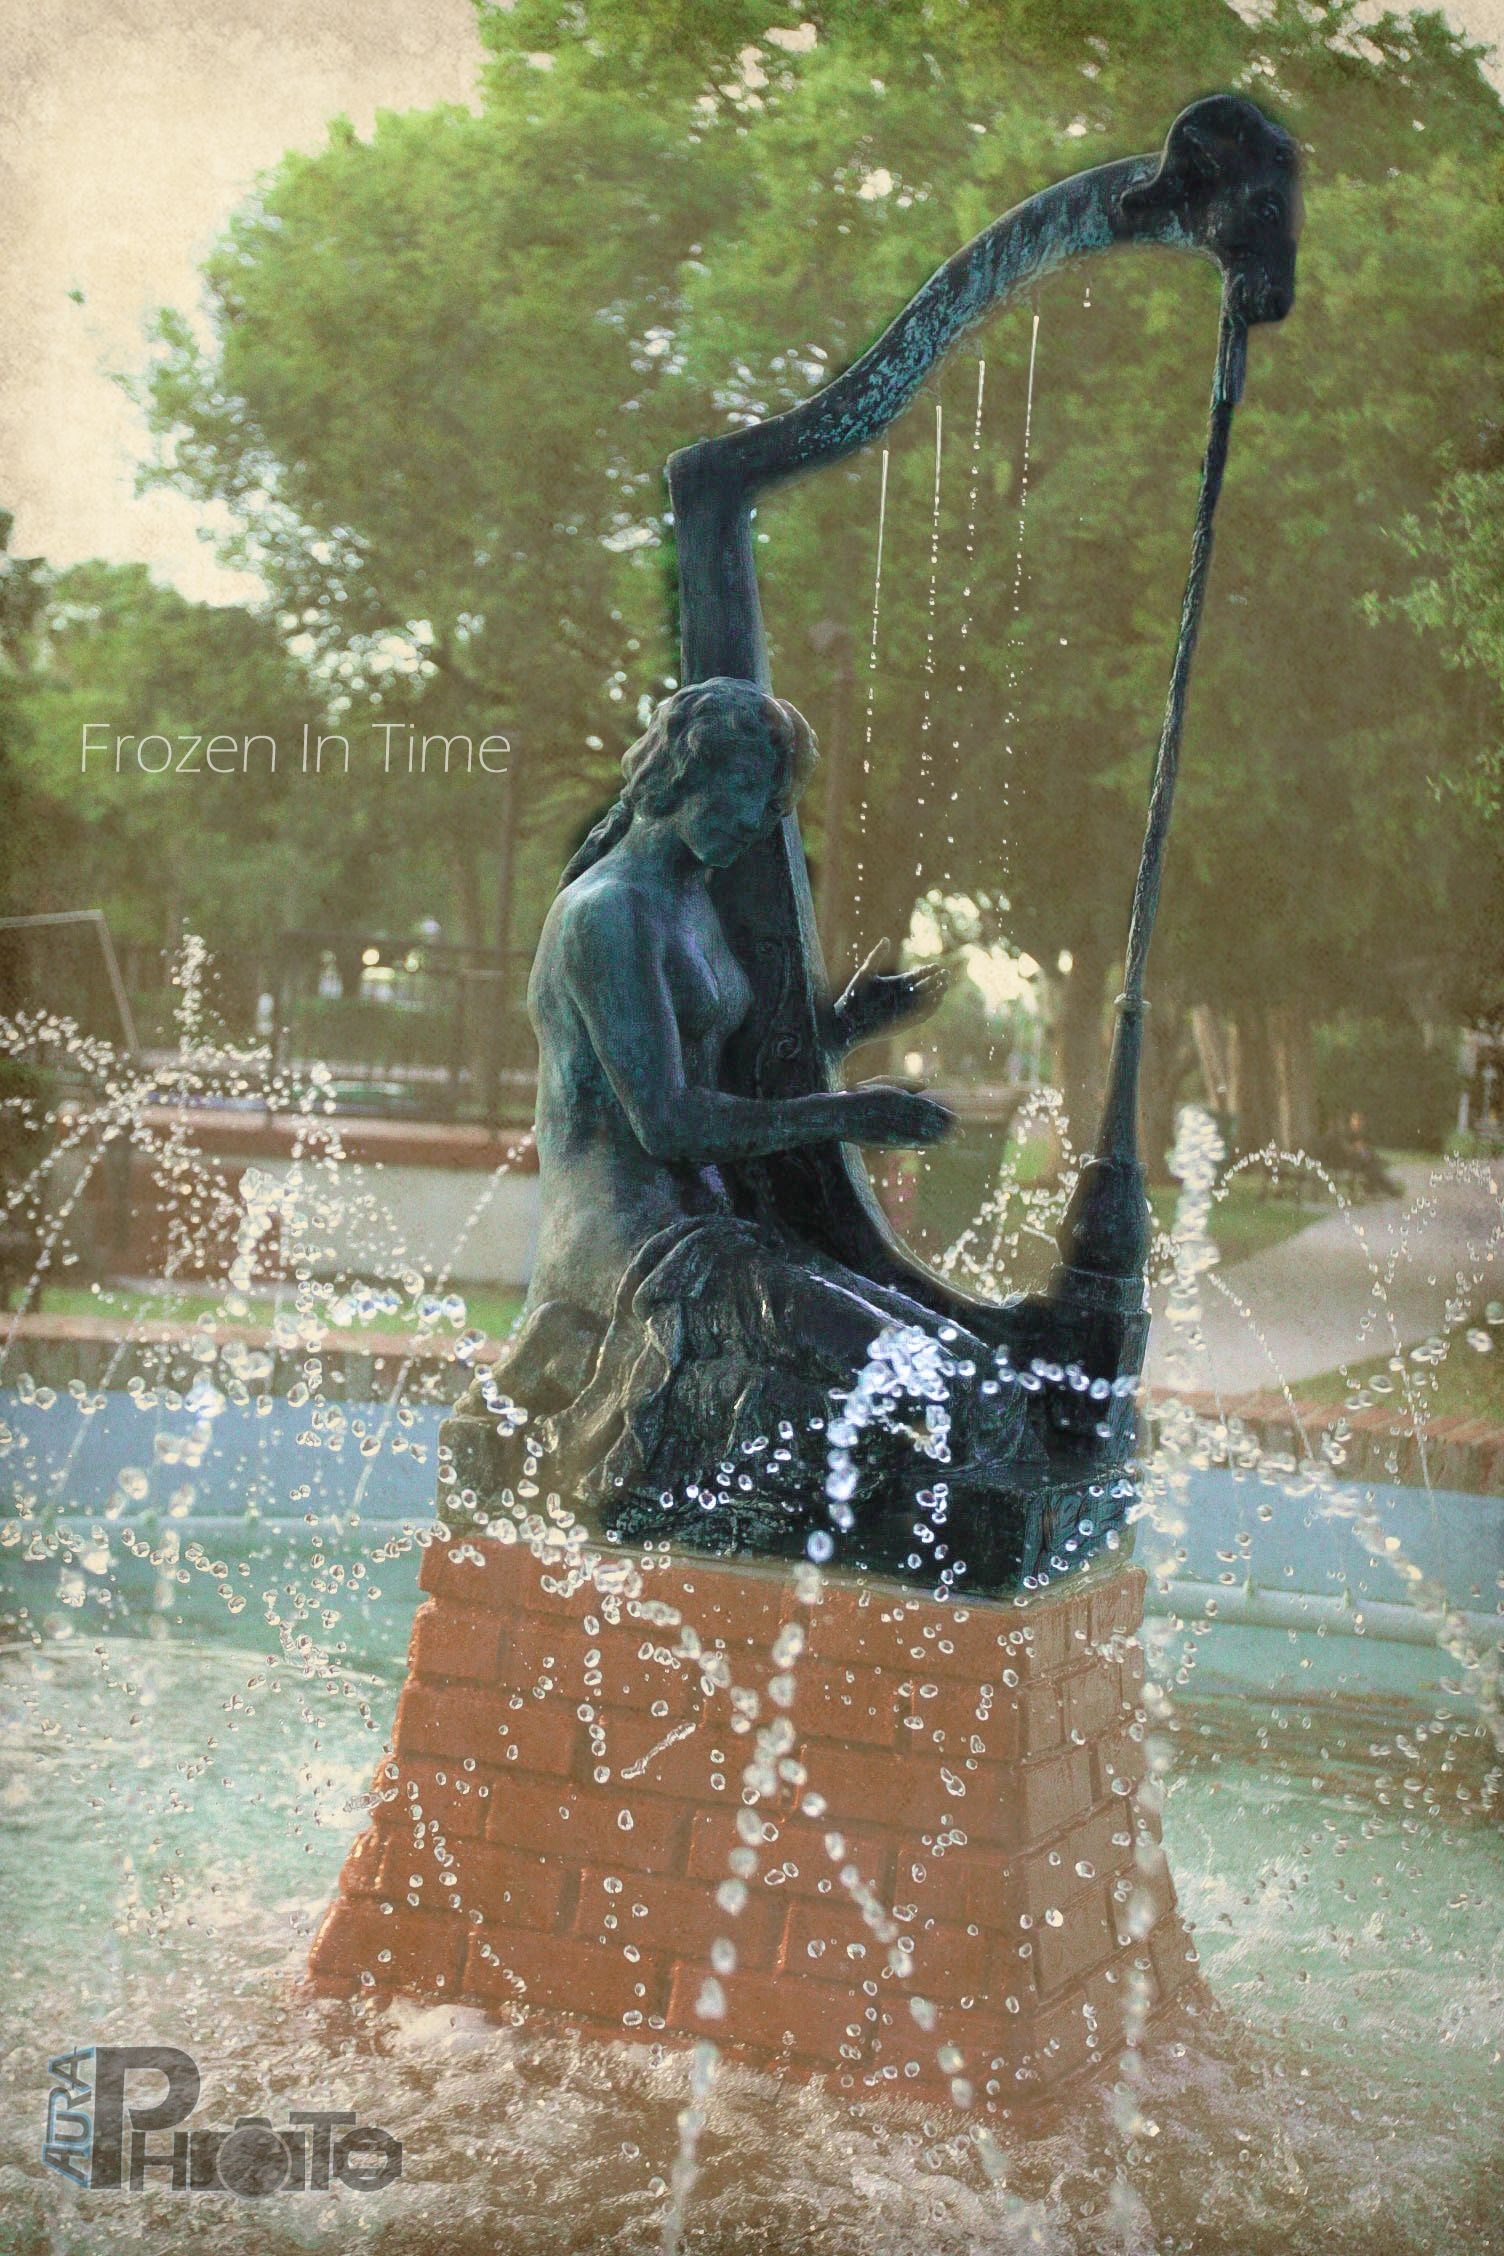 Stunning fountains with water harp. Beautiful photo!